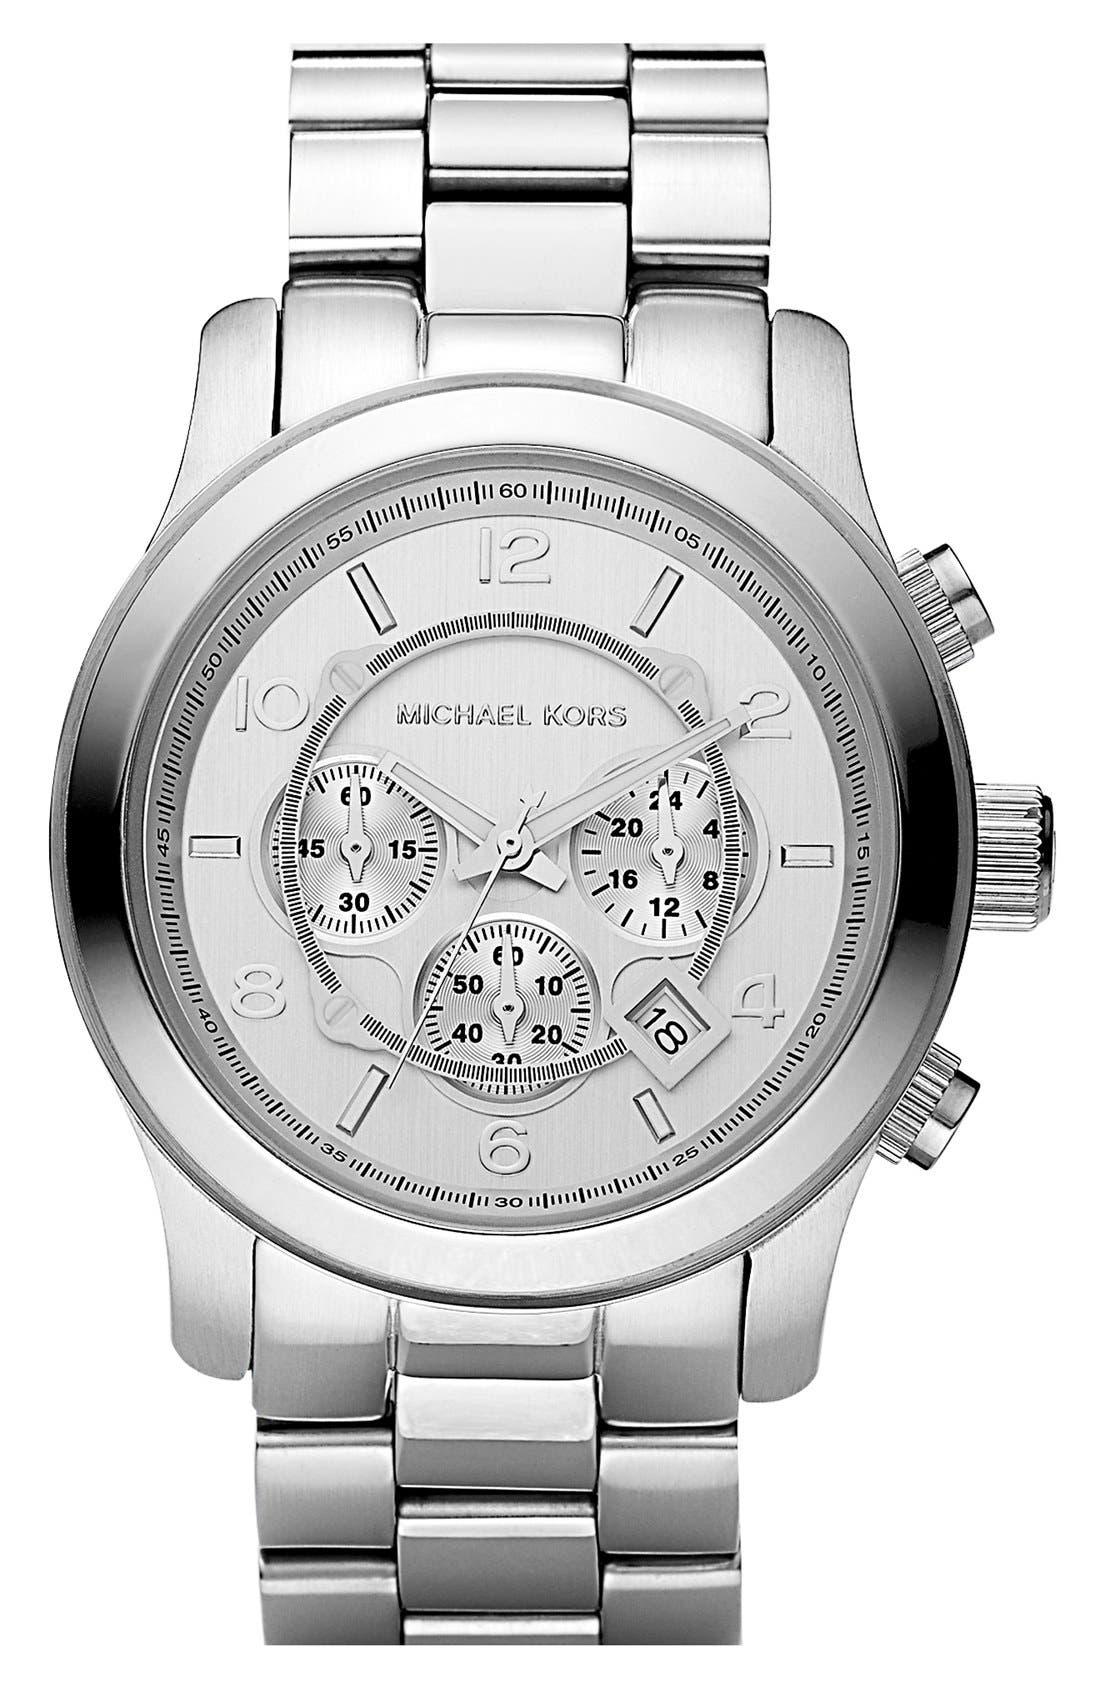 Main Image - Michael Kors 'Silvertone Oversize Iconic' Chronograph Watch, 45mm